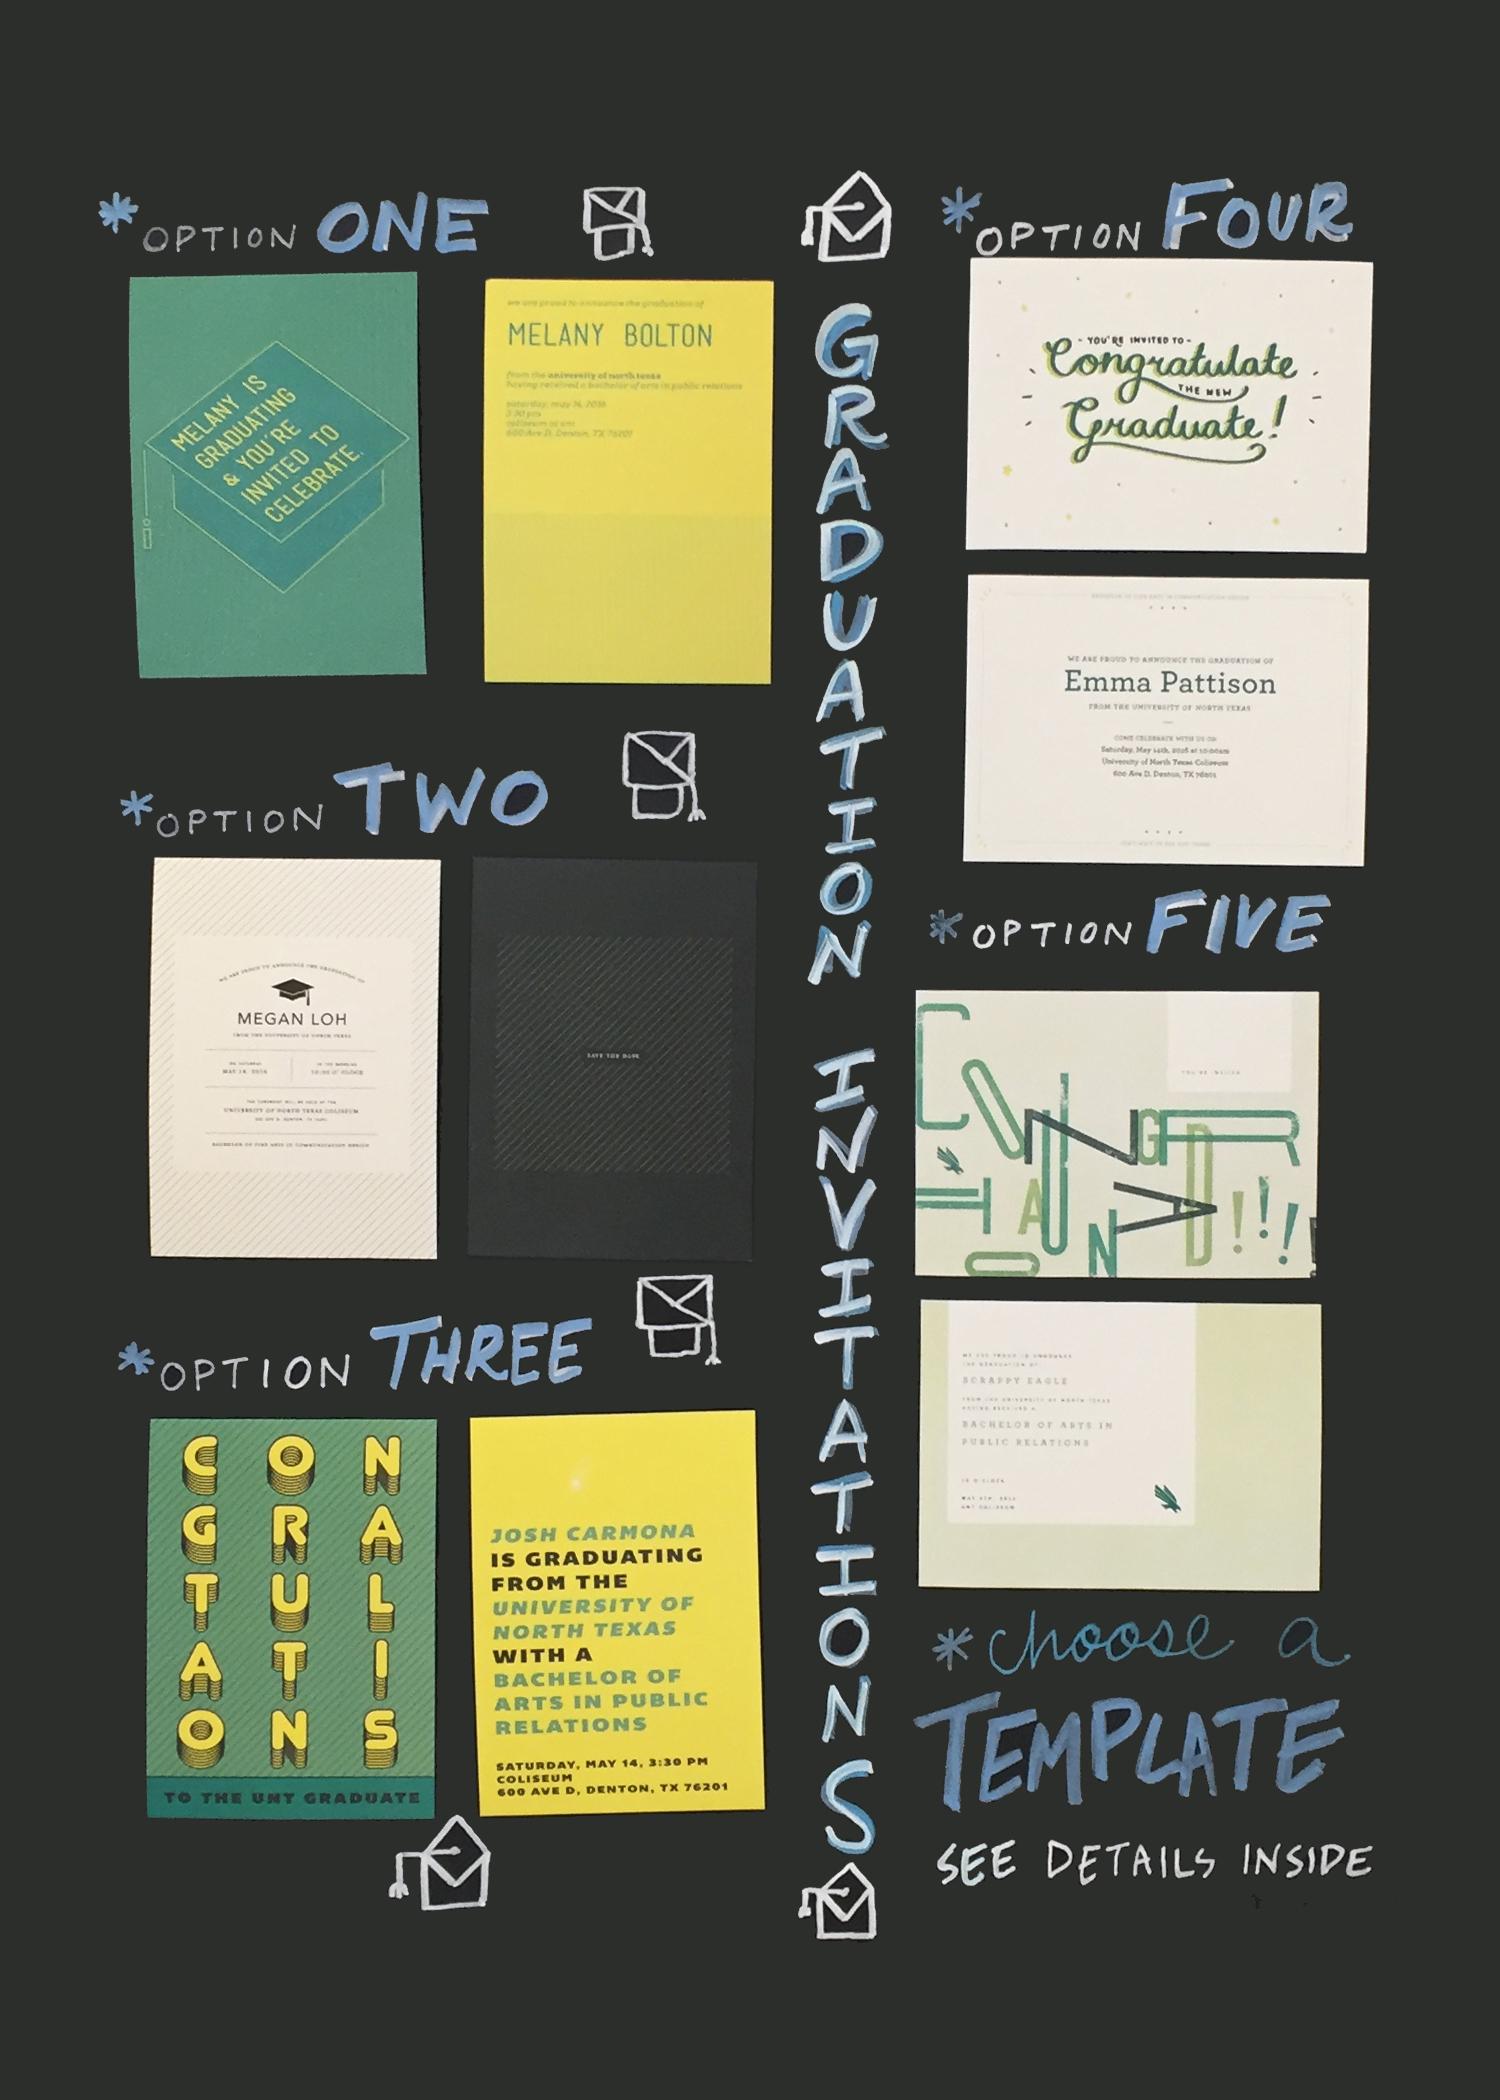 Graduation Photos and Invitations by Design Works – UNT University Union